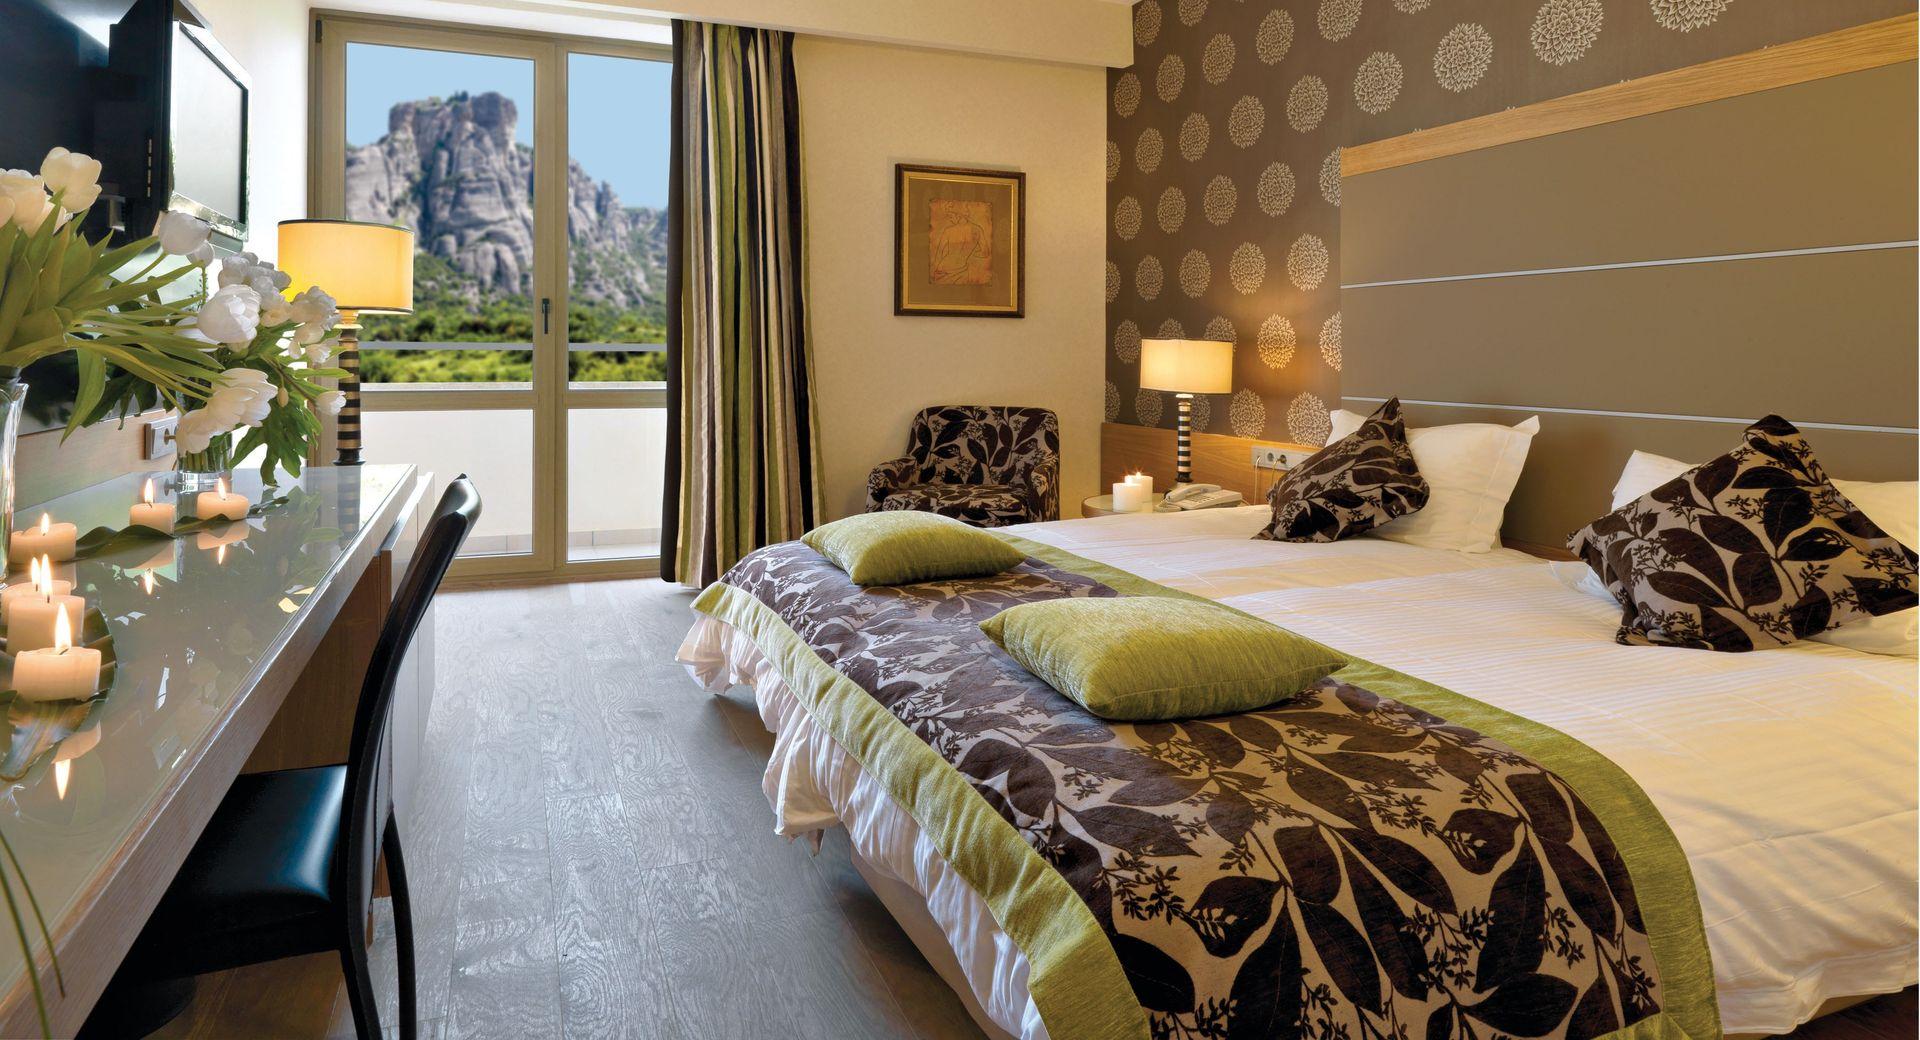 Divani Meteora Hotel - Offers - Advance Purchase